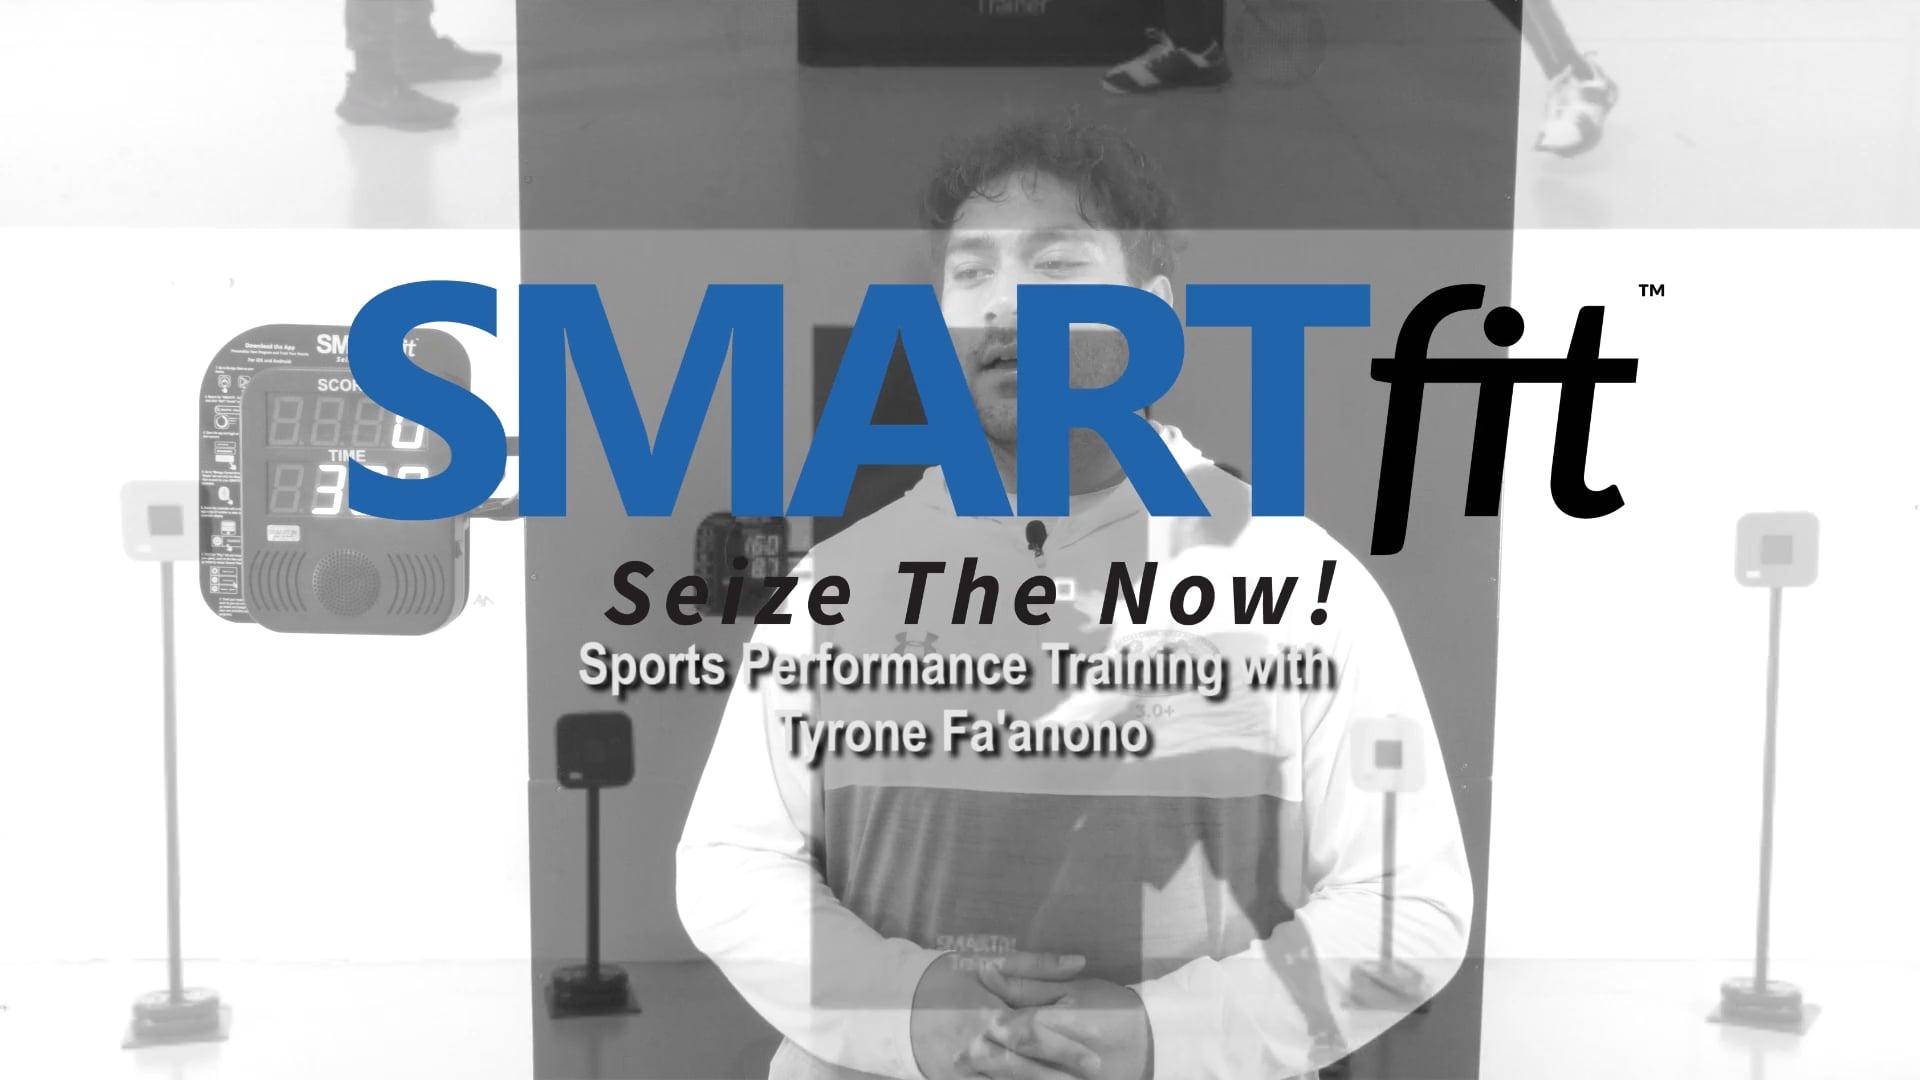 Sports Performance Training with Tyrone Fa'anono